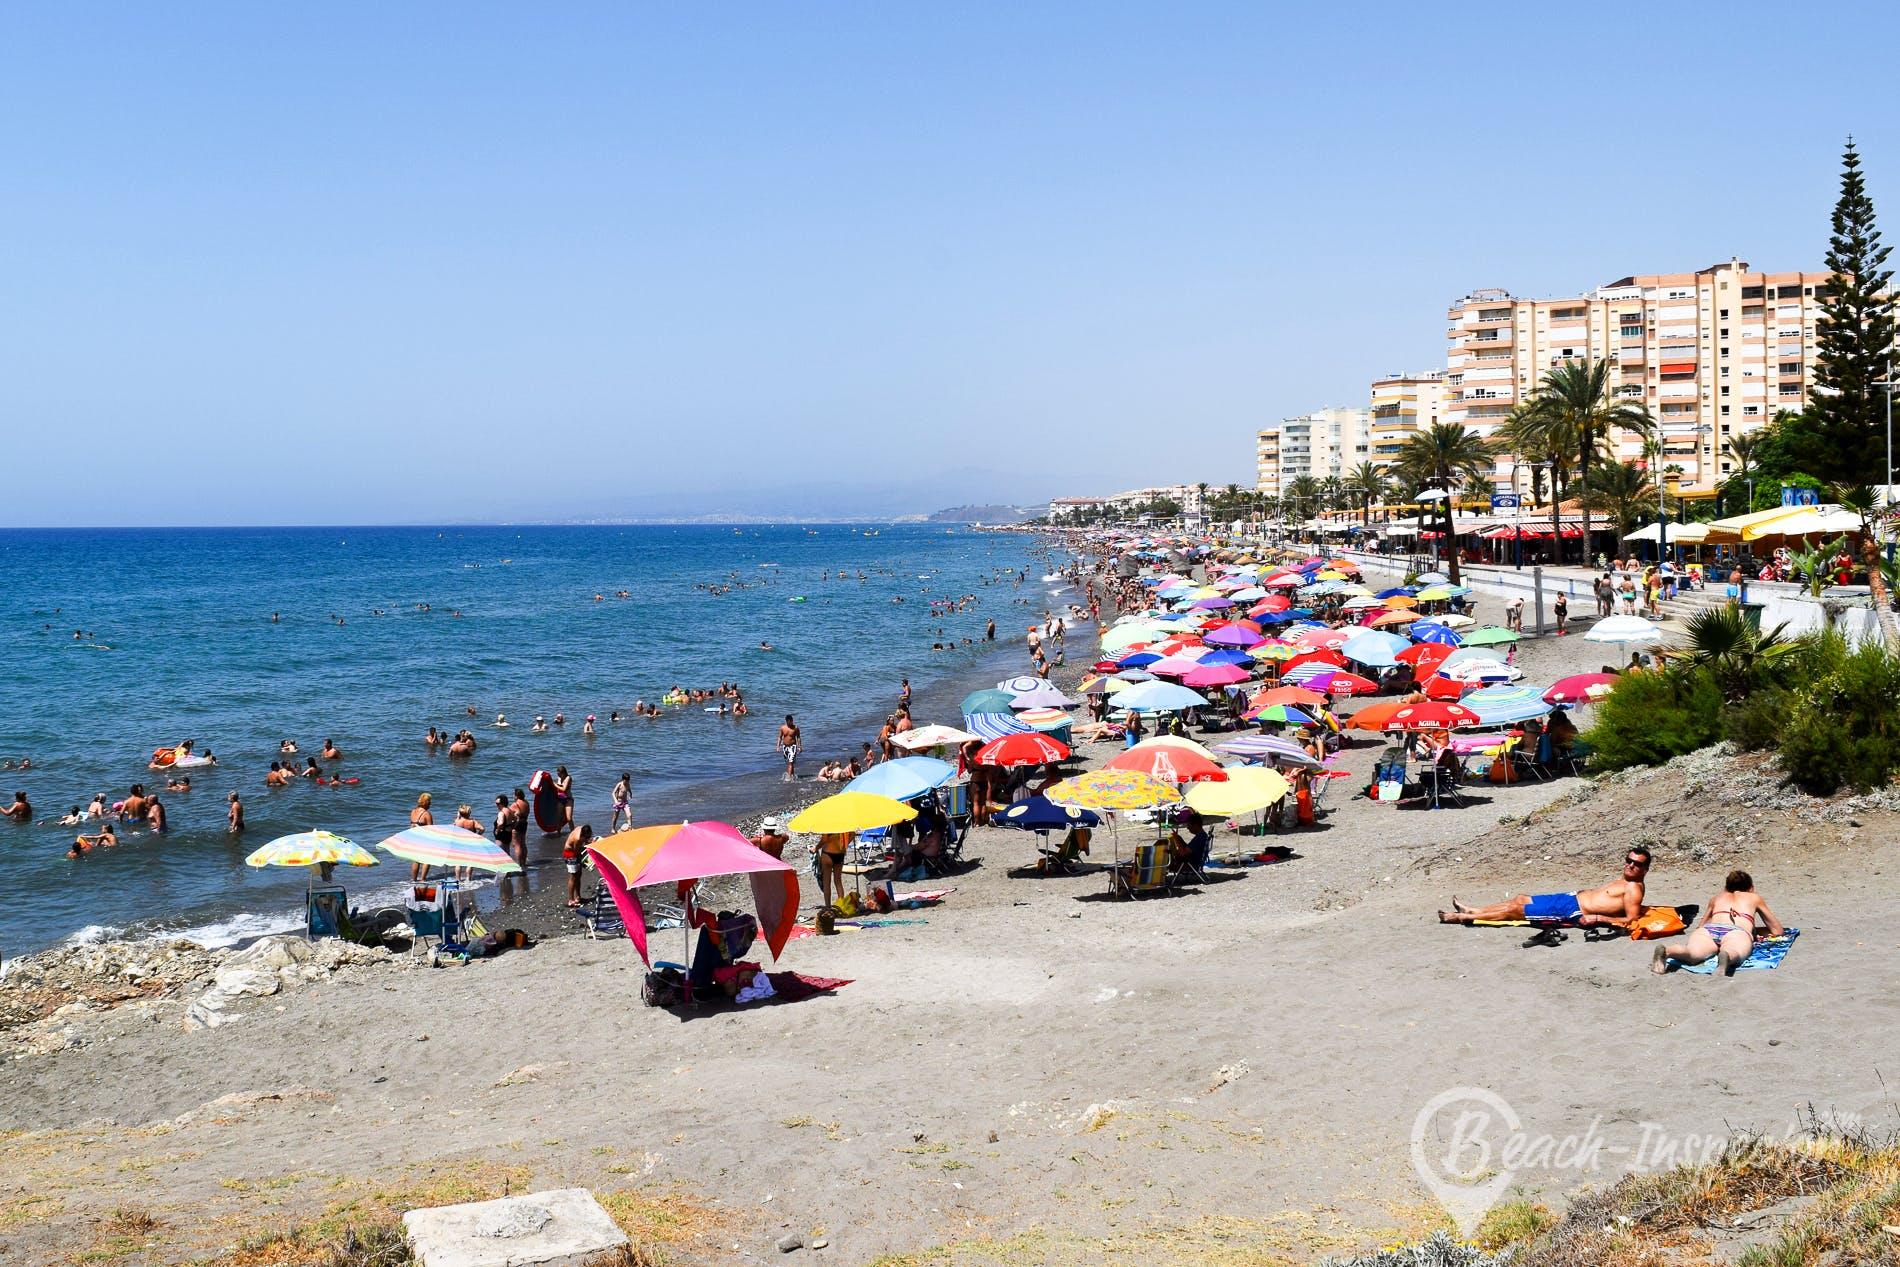 Beach Playa de Ferrara, Costa del Sol, Spain